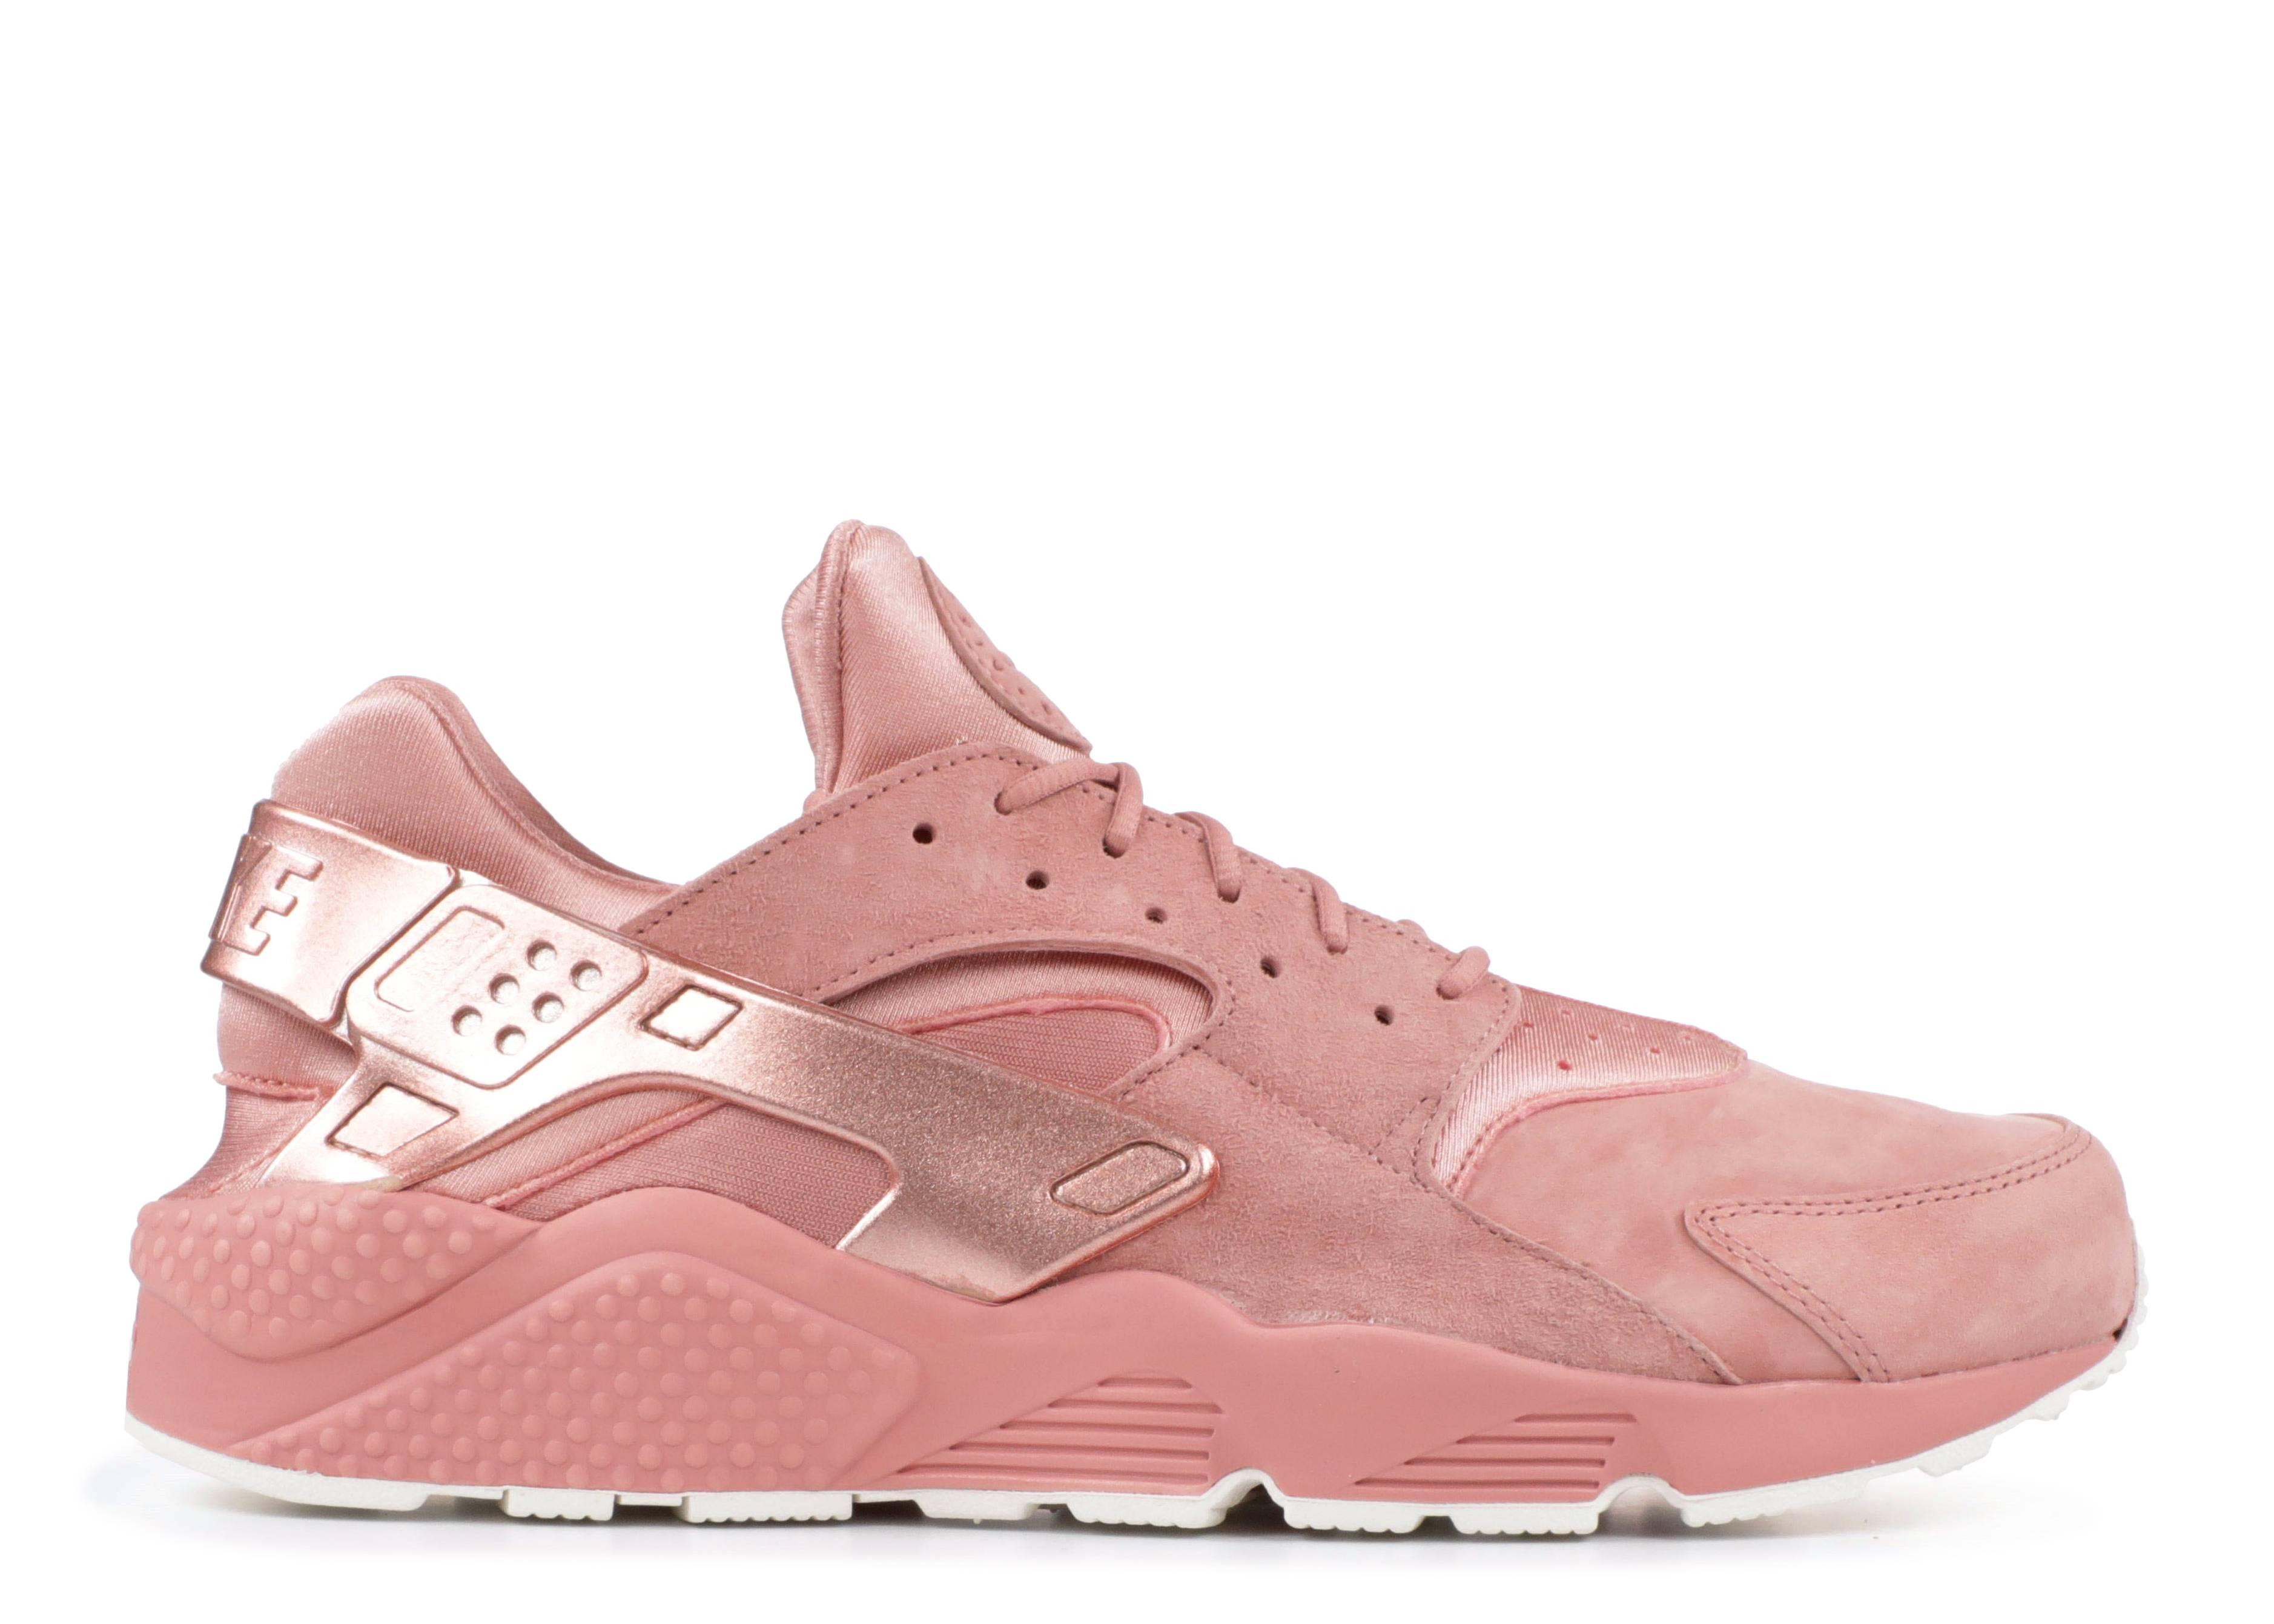 4f18f07b757a1 Nike Air Huarache Run Prm - Nike - 704830 601 - rust pink mtlc red ...